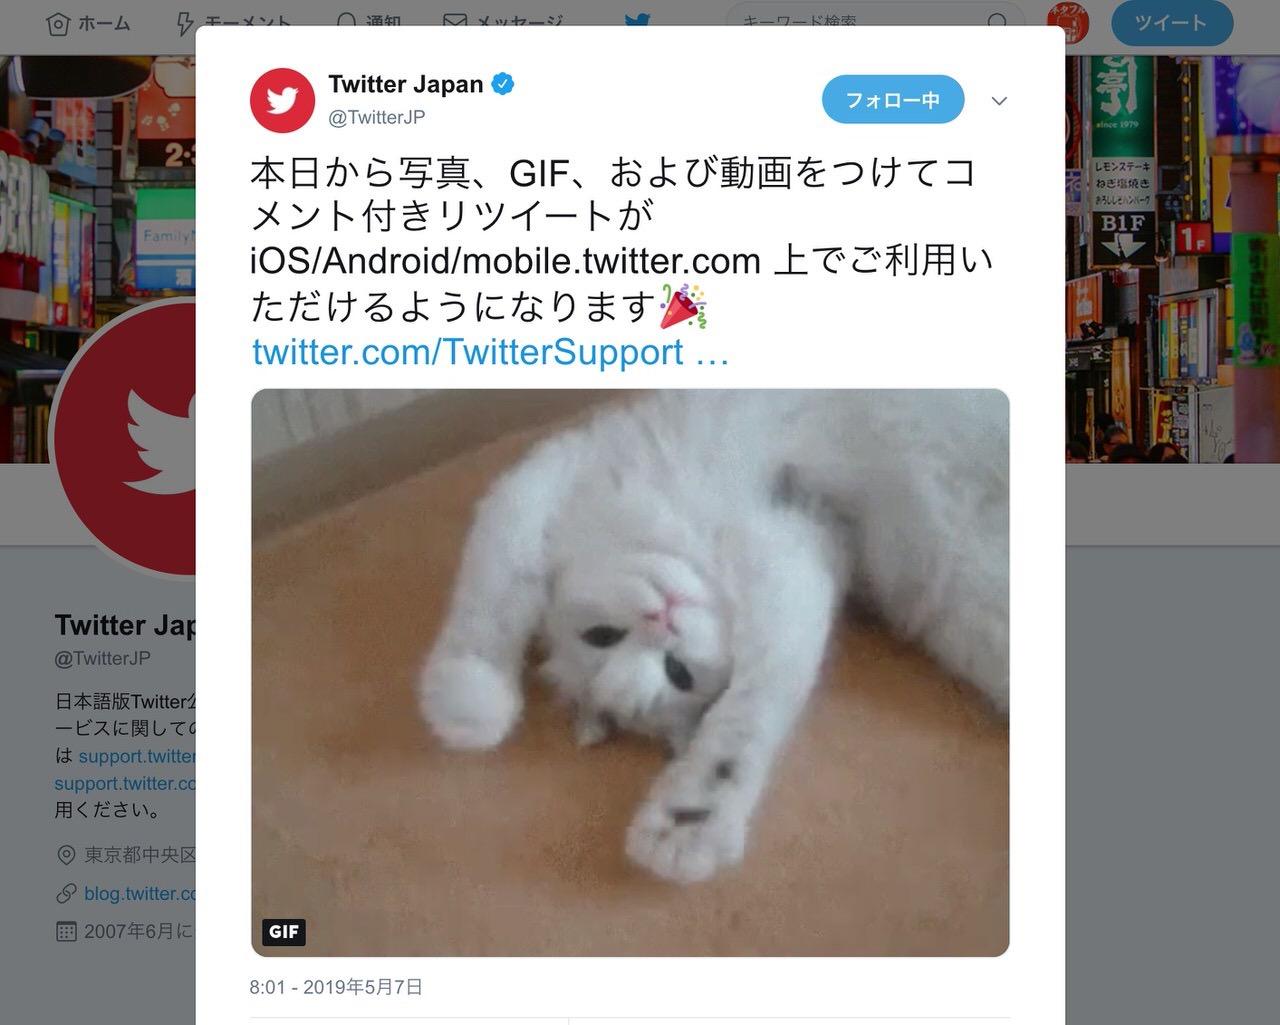 【Twitter】写真・GIF・動画をつけたコメント付きリツイートが可能に